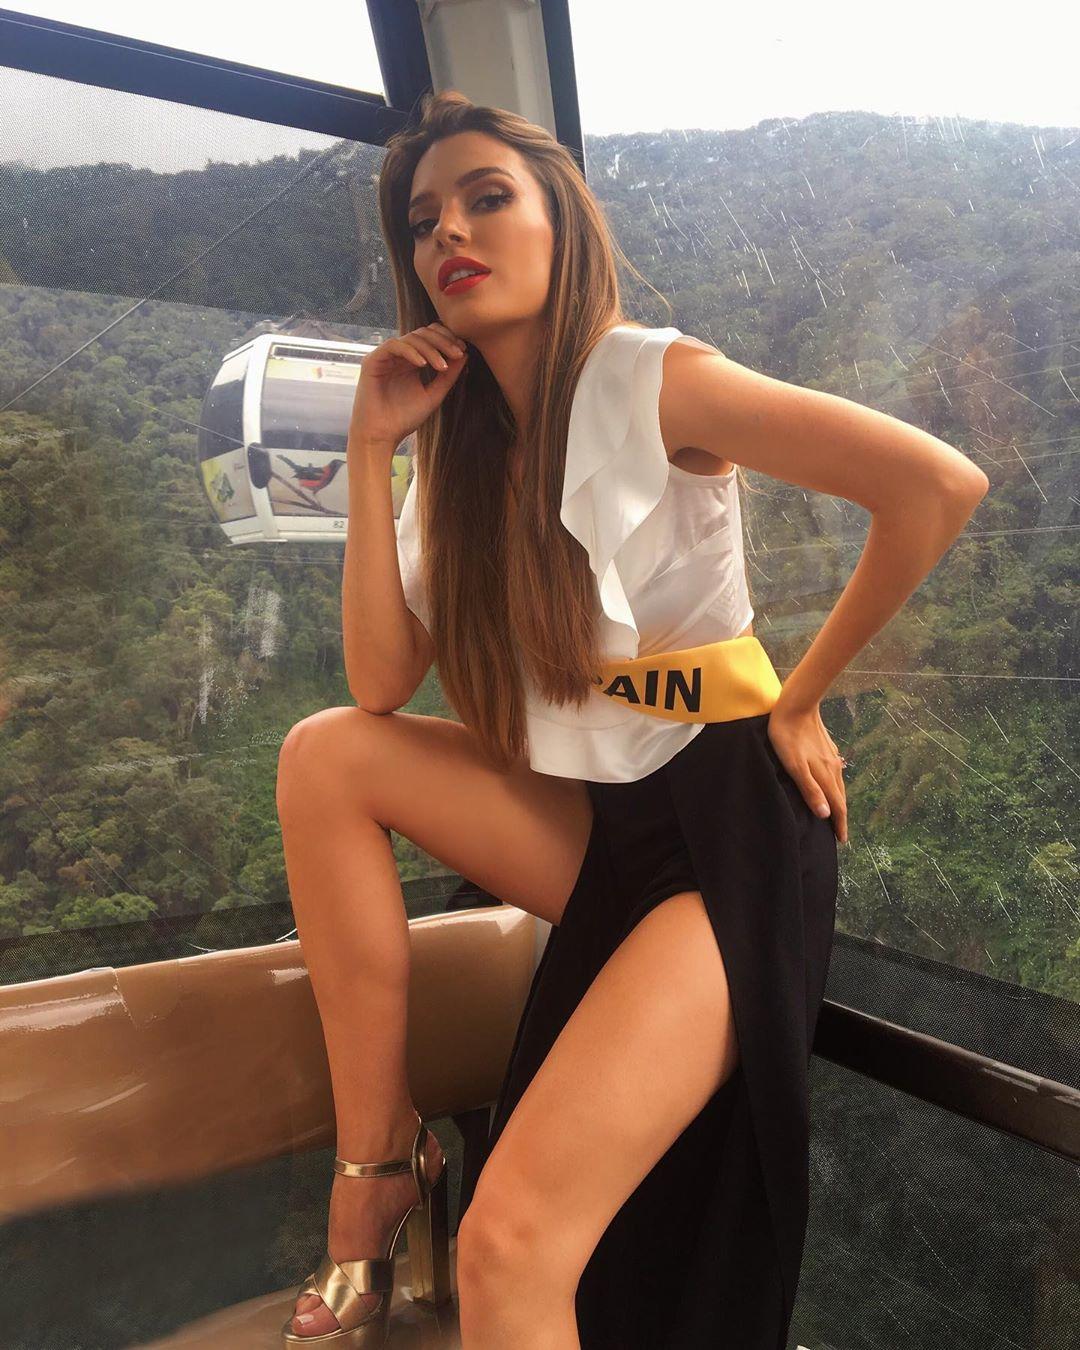 ainara de santamaria villamor, top 21 de miss grand international 2019/miss world cantabria 2018/miss earth spain 2017. - Página 14 69542210